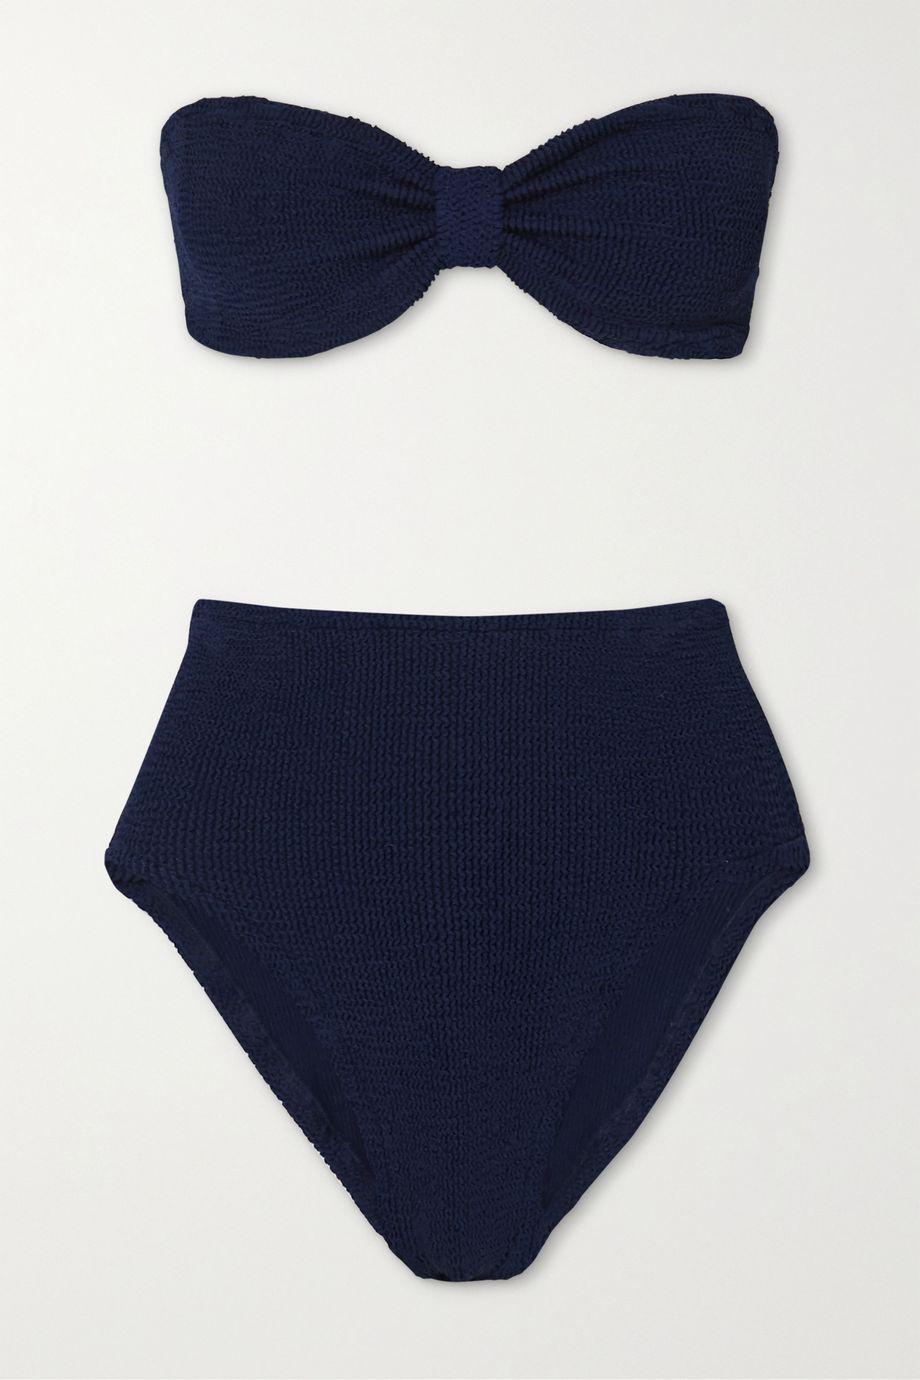 Hunza G Posey seersucker bandeau bikini